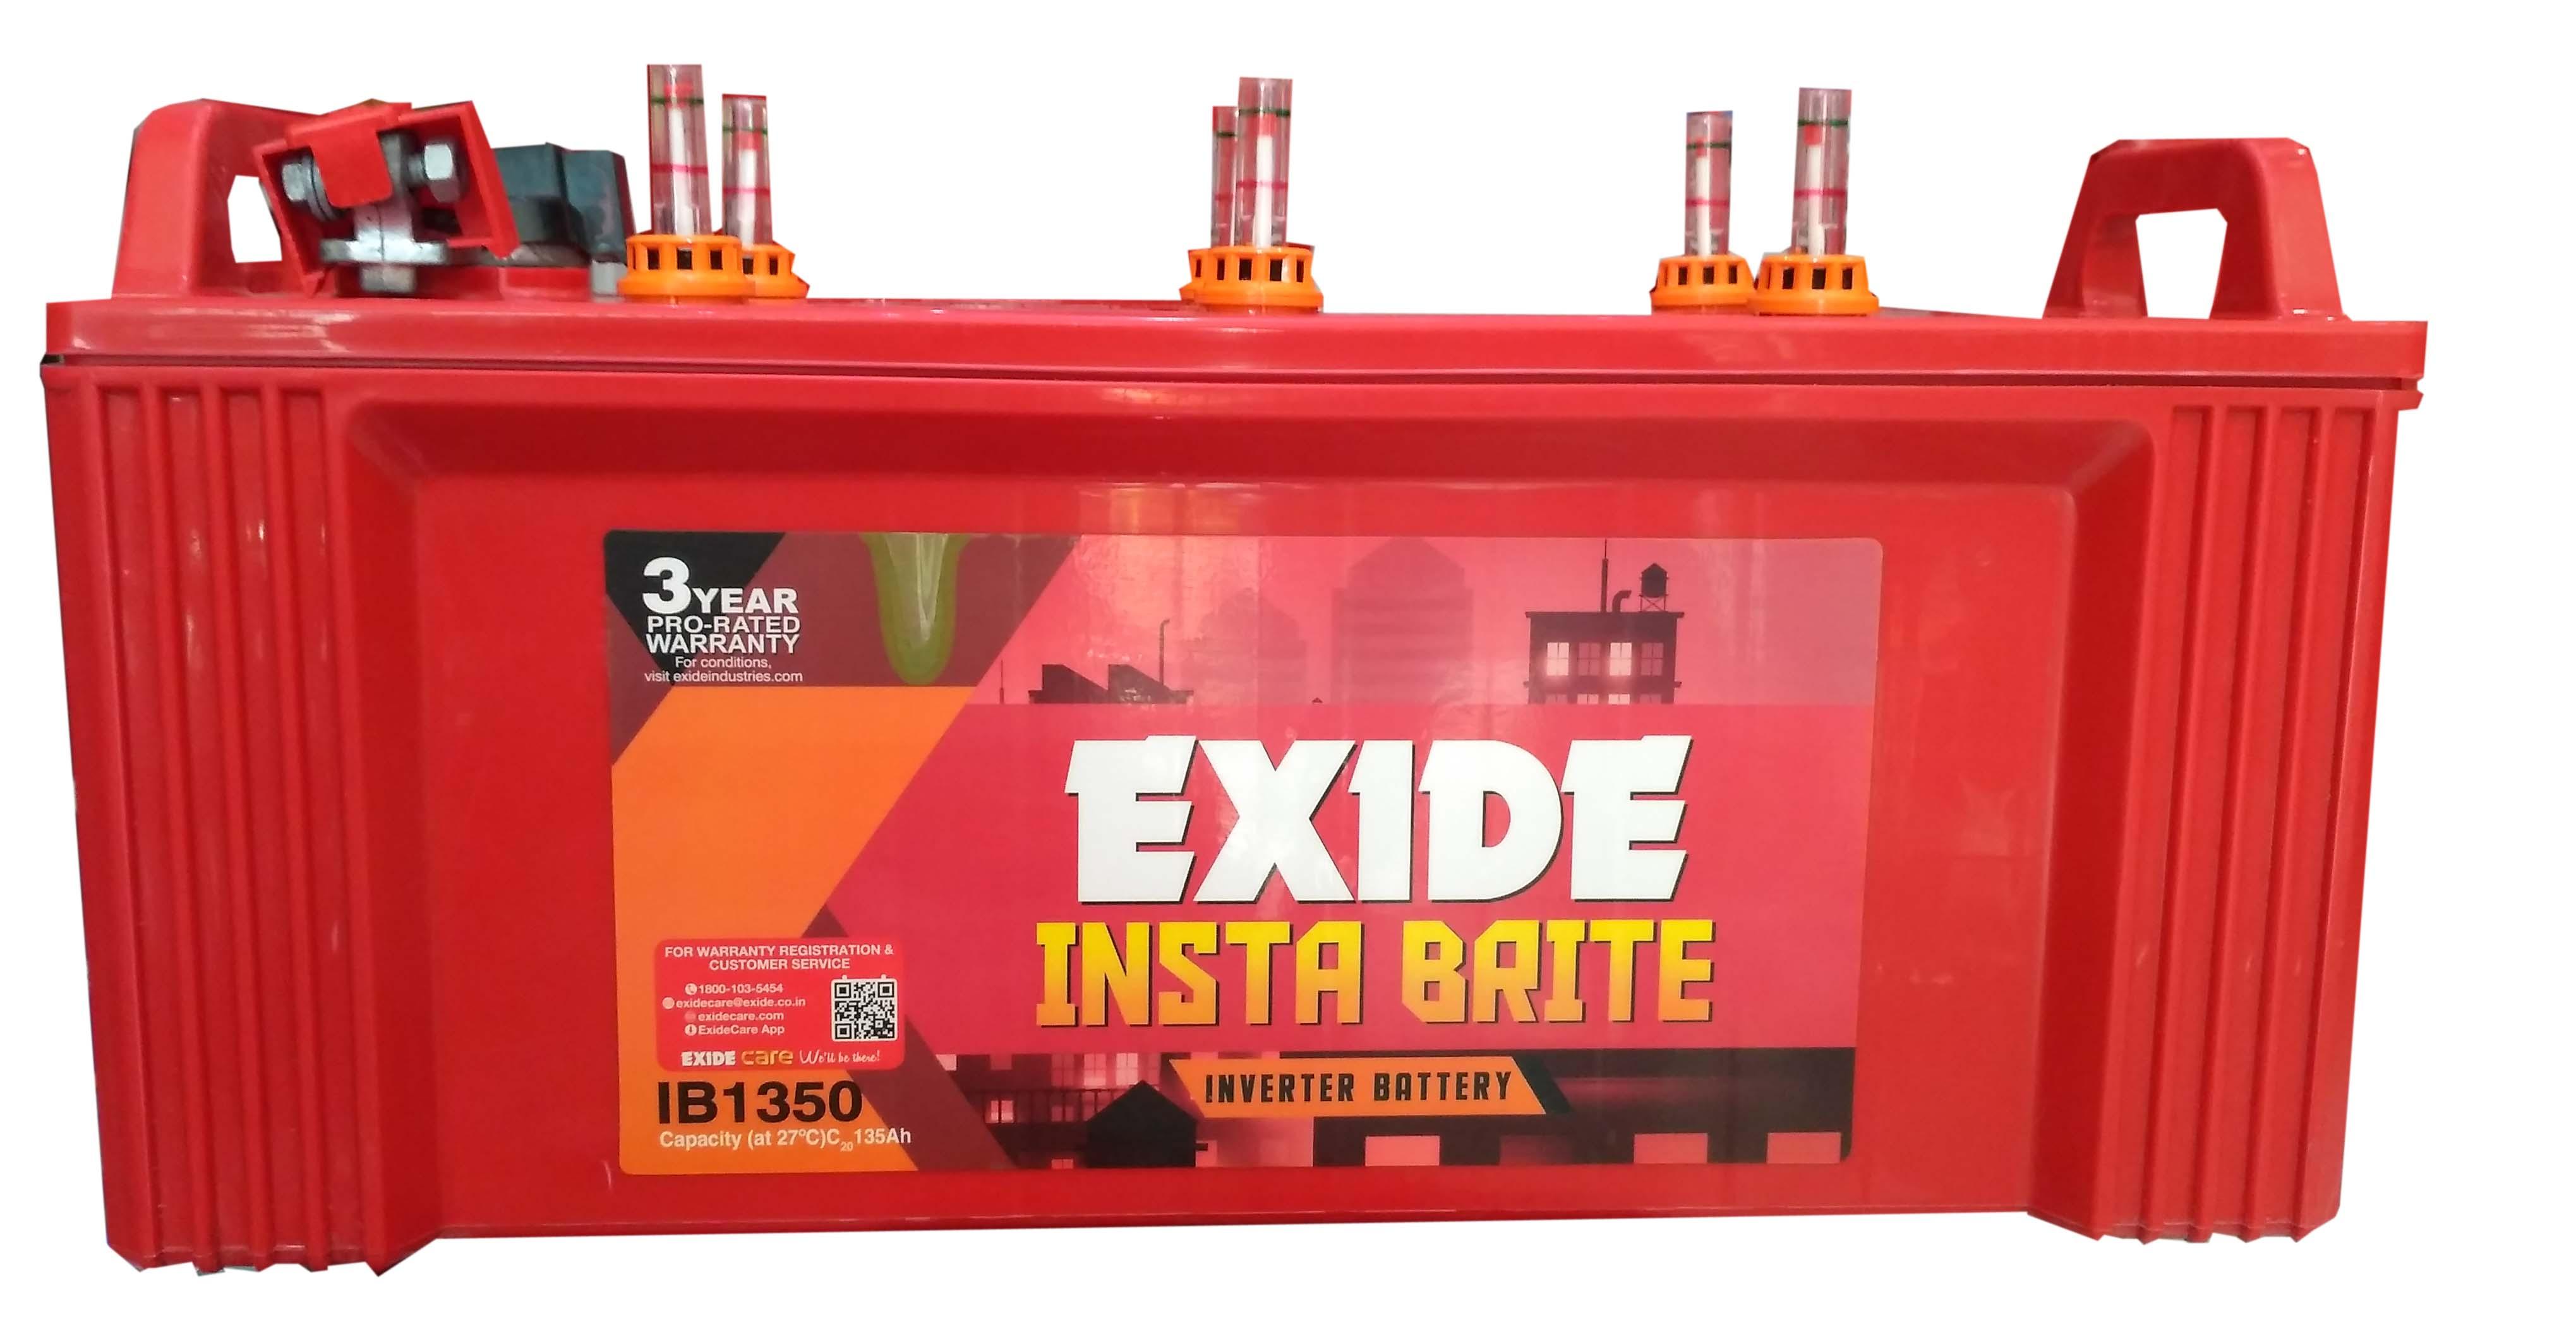 Exide Instabrite 1350 inverter batery 135 ah